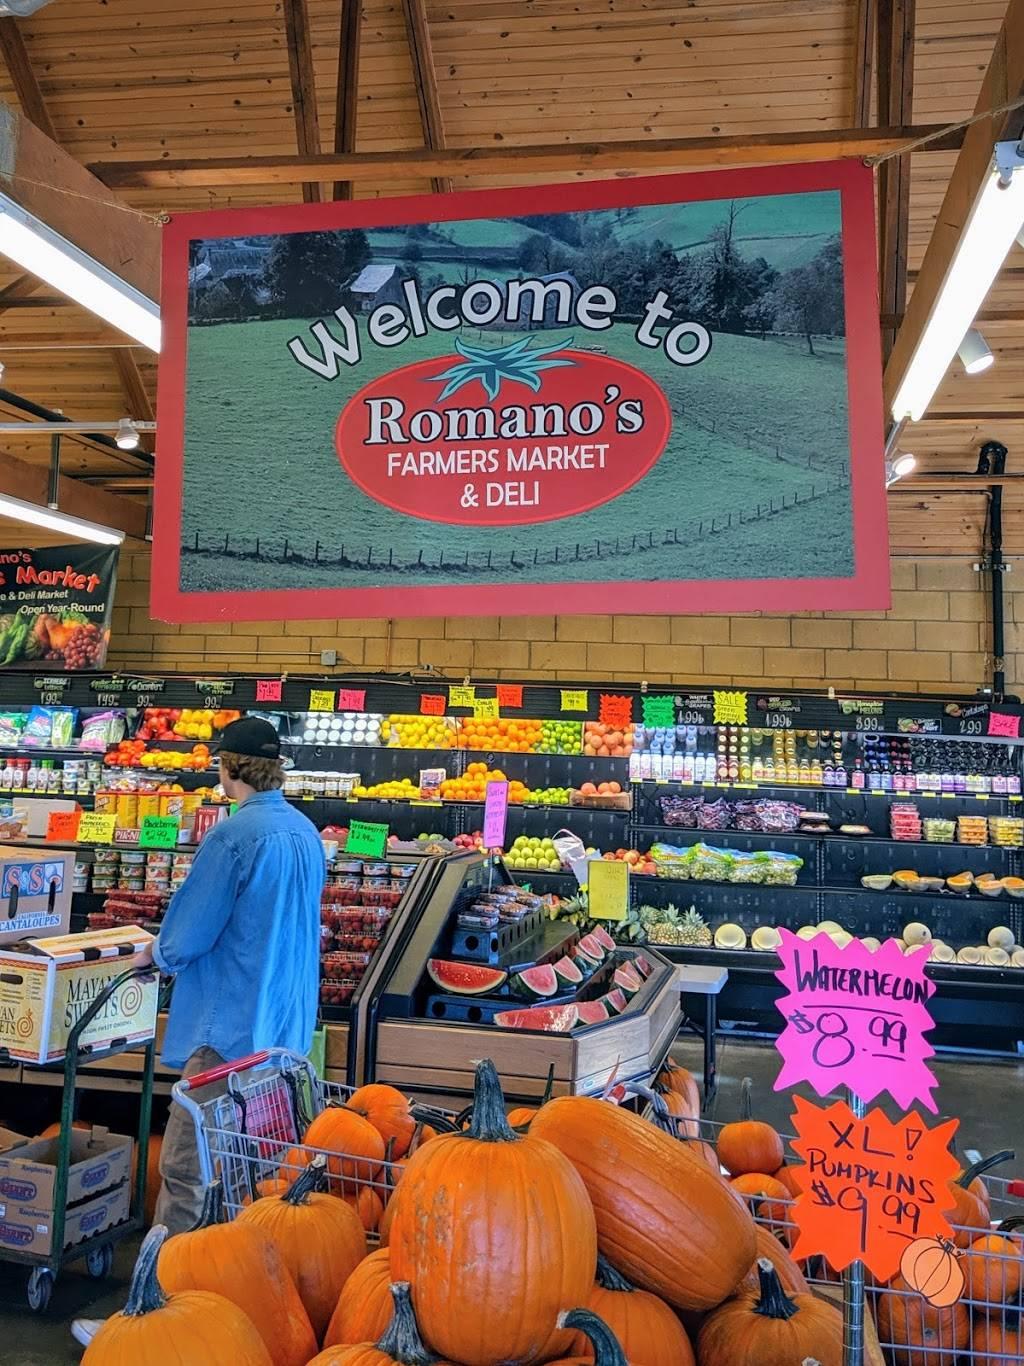 Romanos Farmers Market & Deli - store  | Photo 2 of 3 | Address: 8875 Ridge Rd, North Royalton, OH 44133, USA | Phone: (440) 237-7888